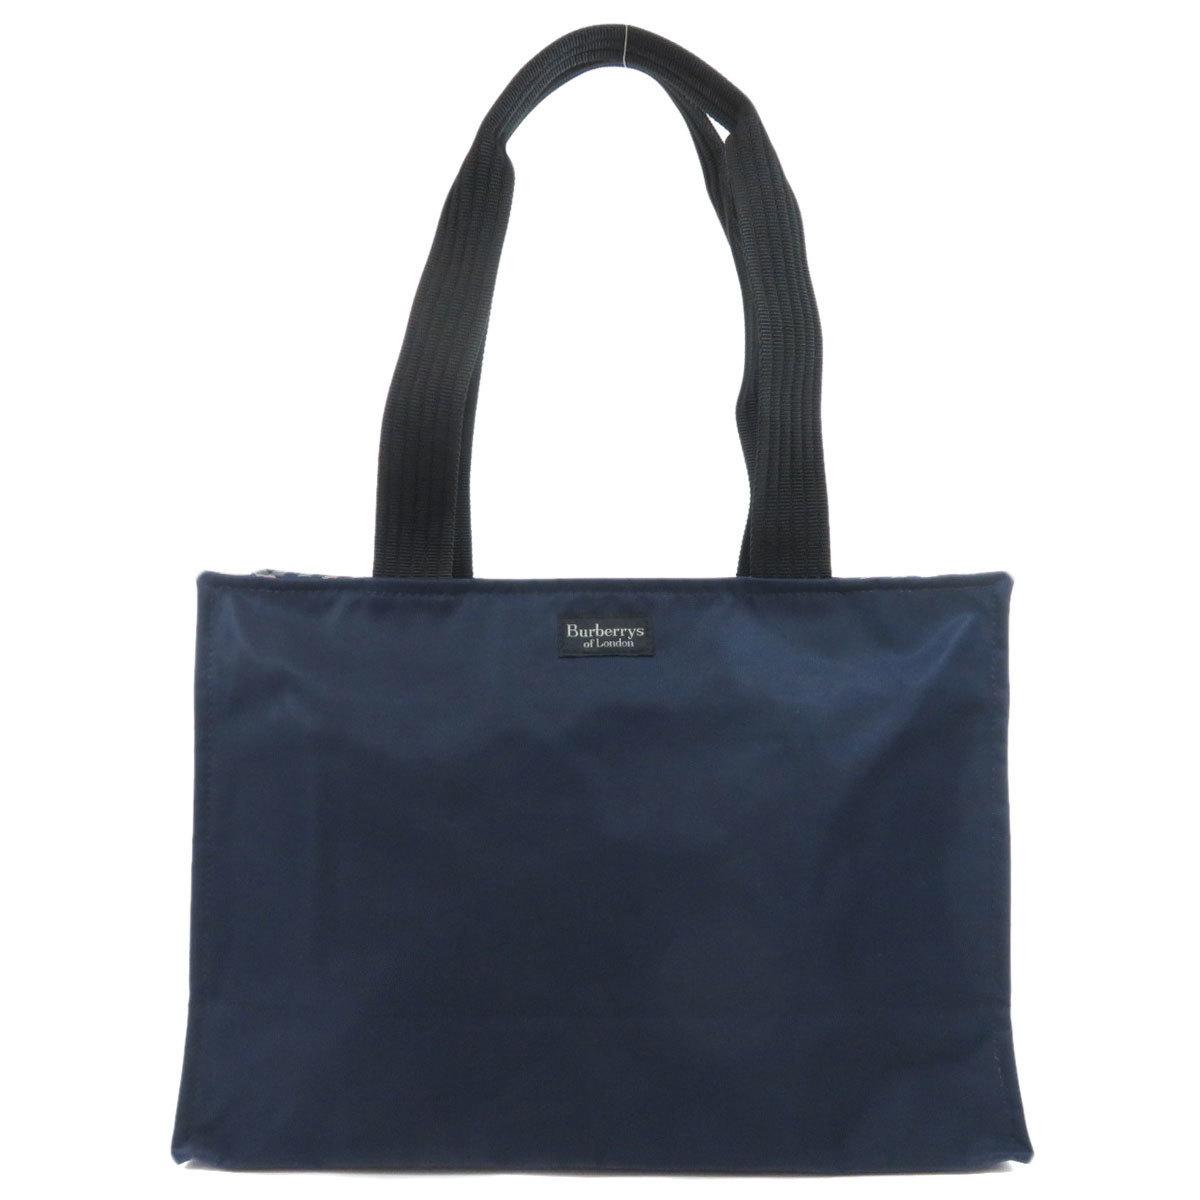 Burberry Logo Motif Tote Bag Nylon Ladies